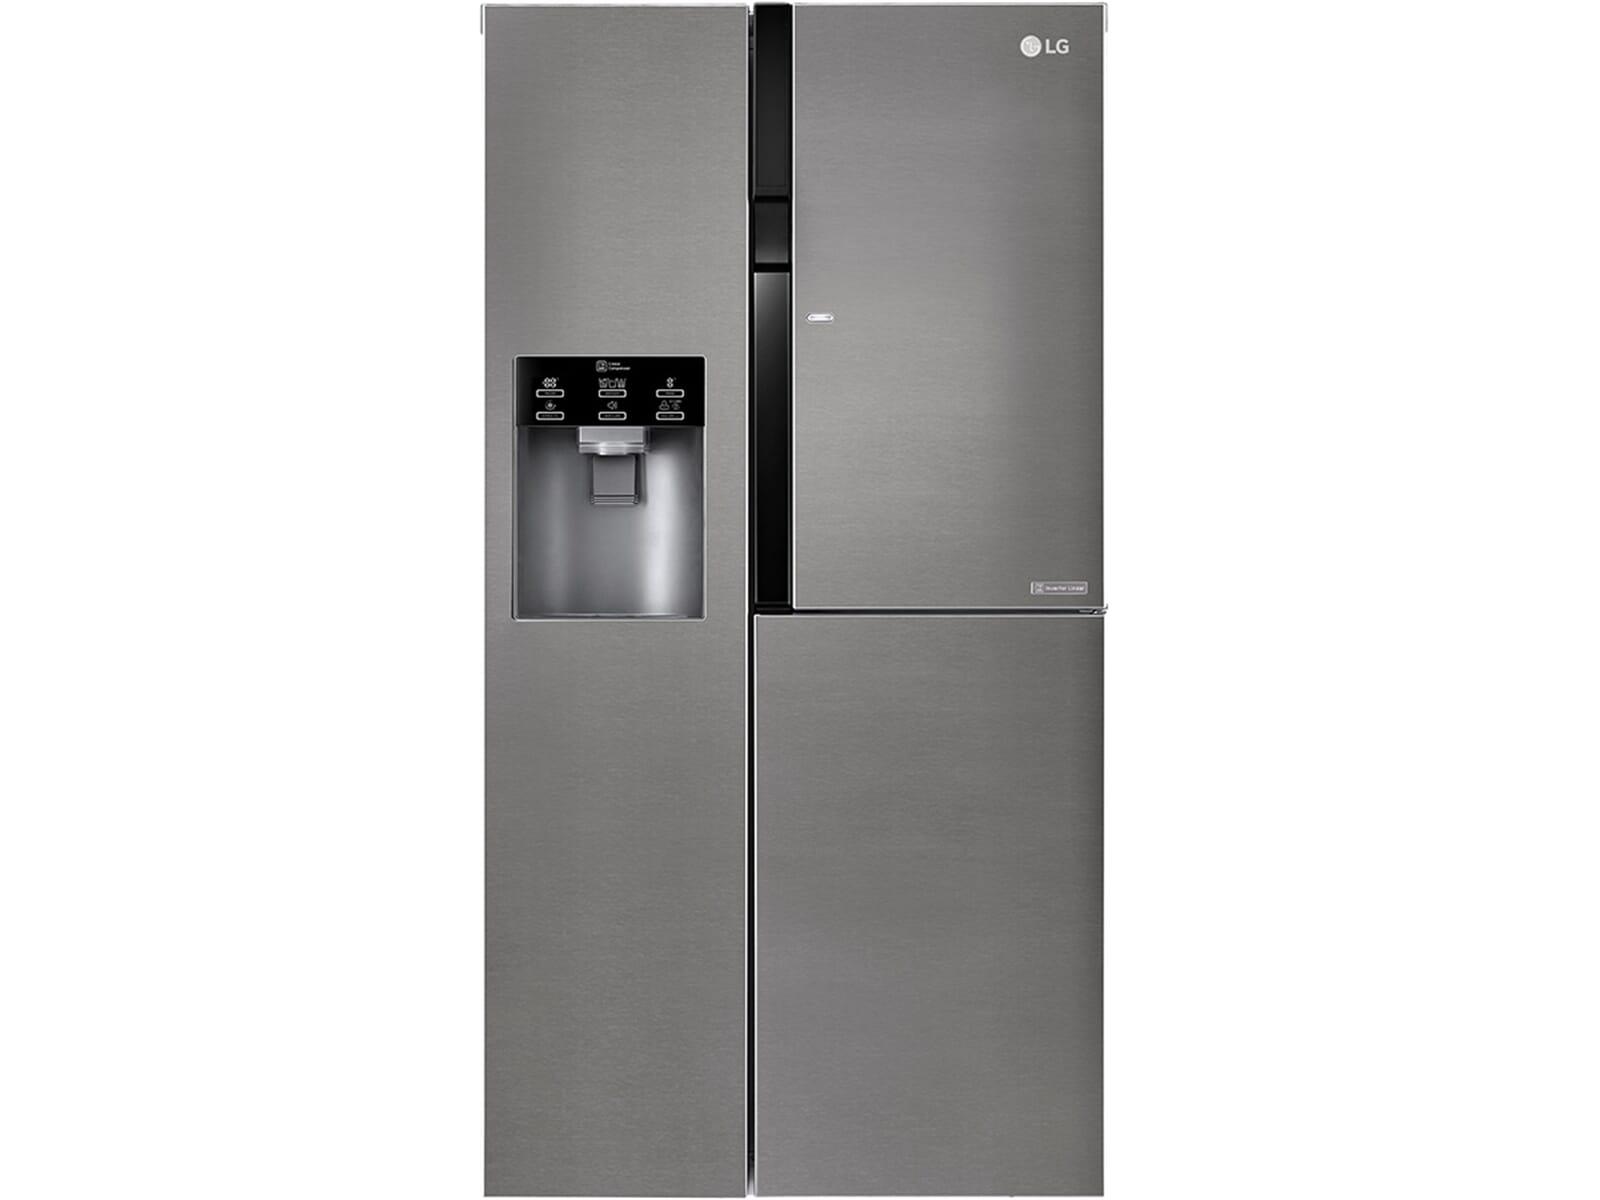 Gorenje Kühlschrank Verliert Wasser : Smeg kühlschrank verliert wasser kühlschrank du hast milch immer